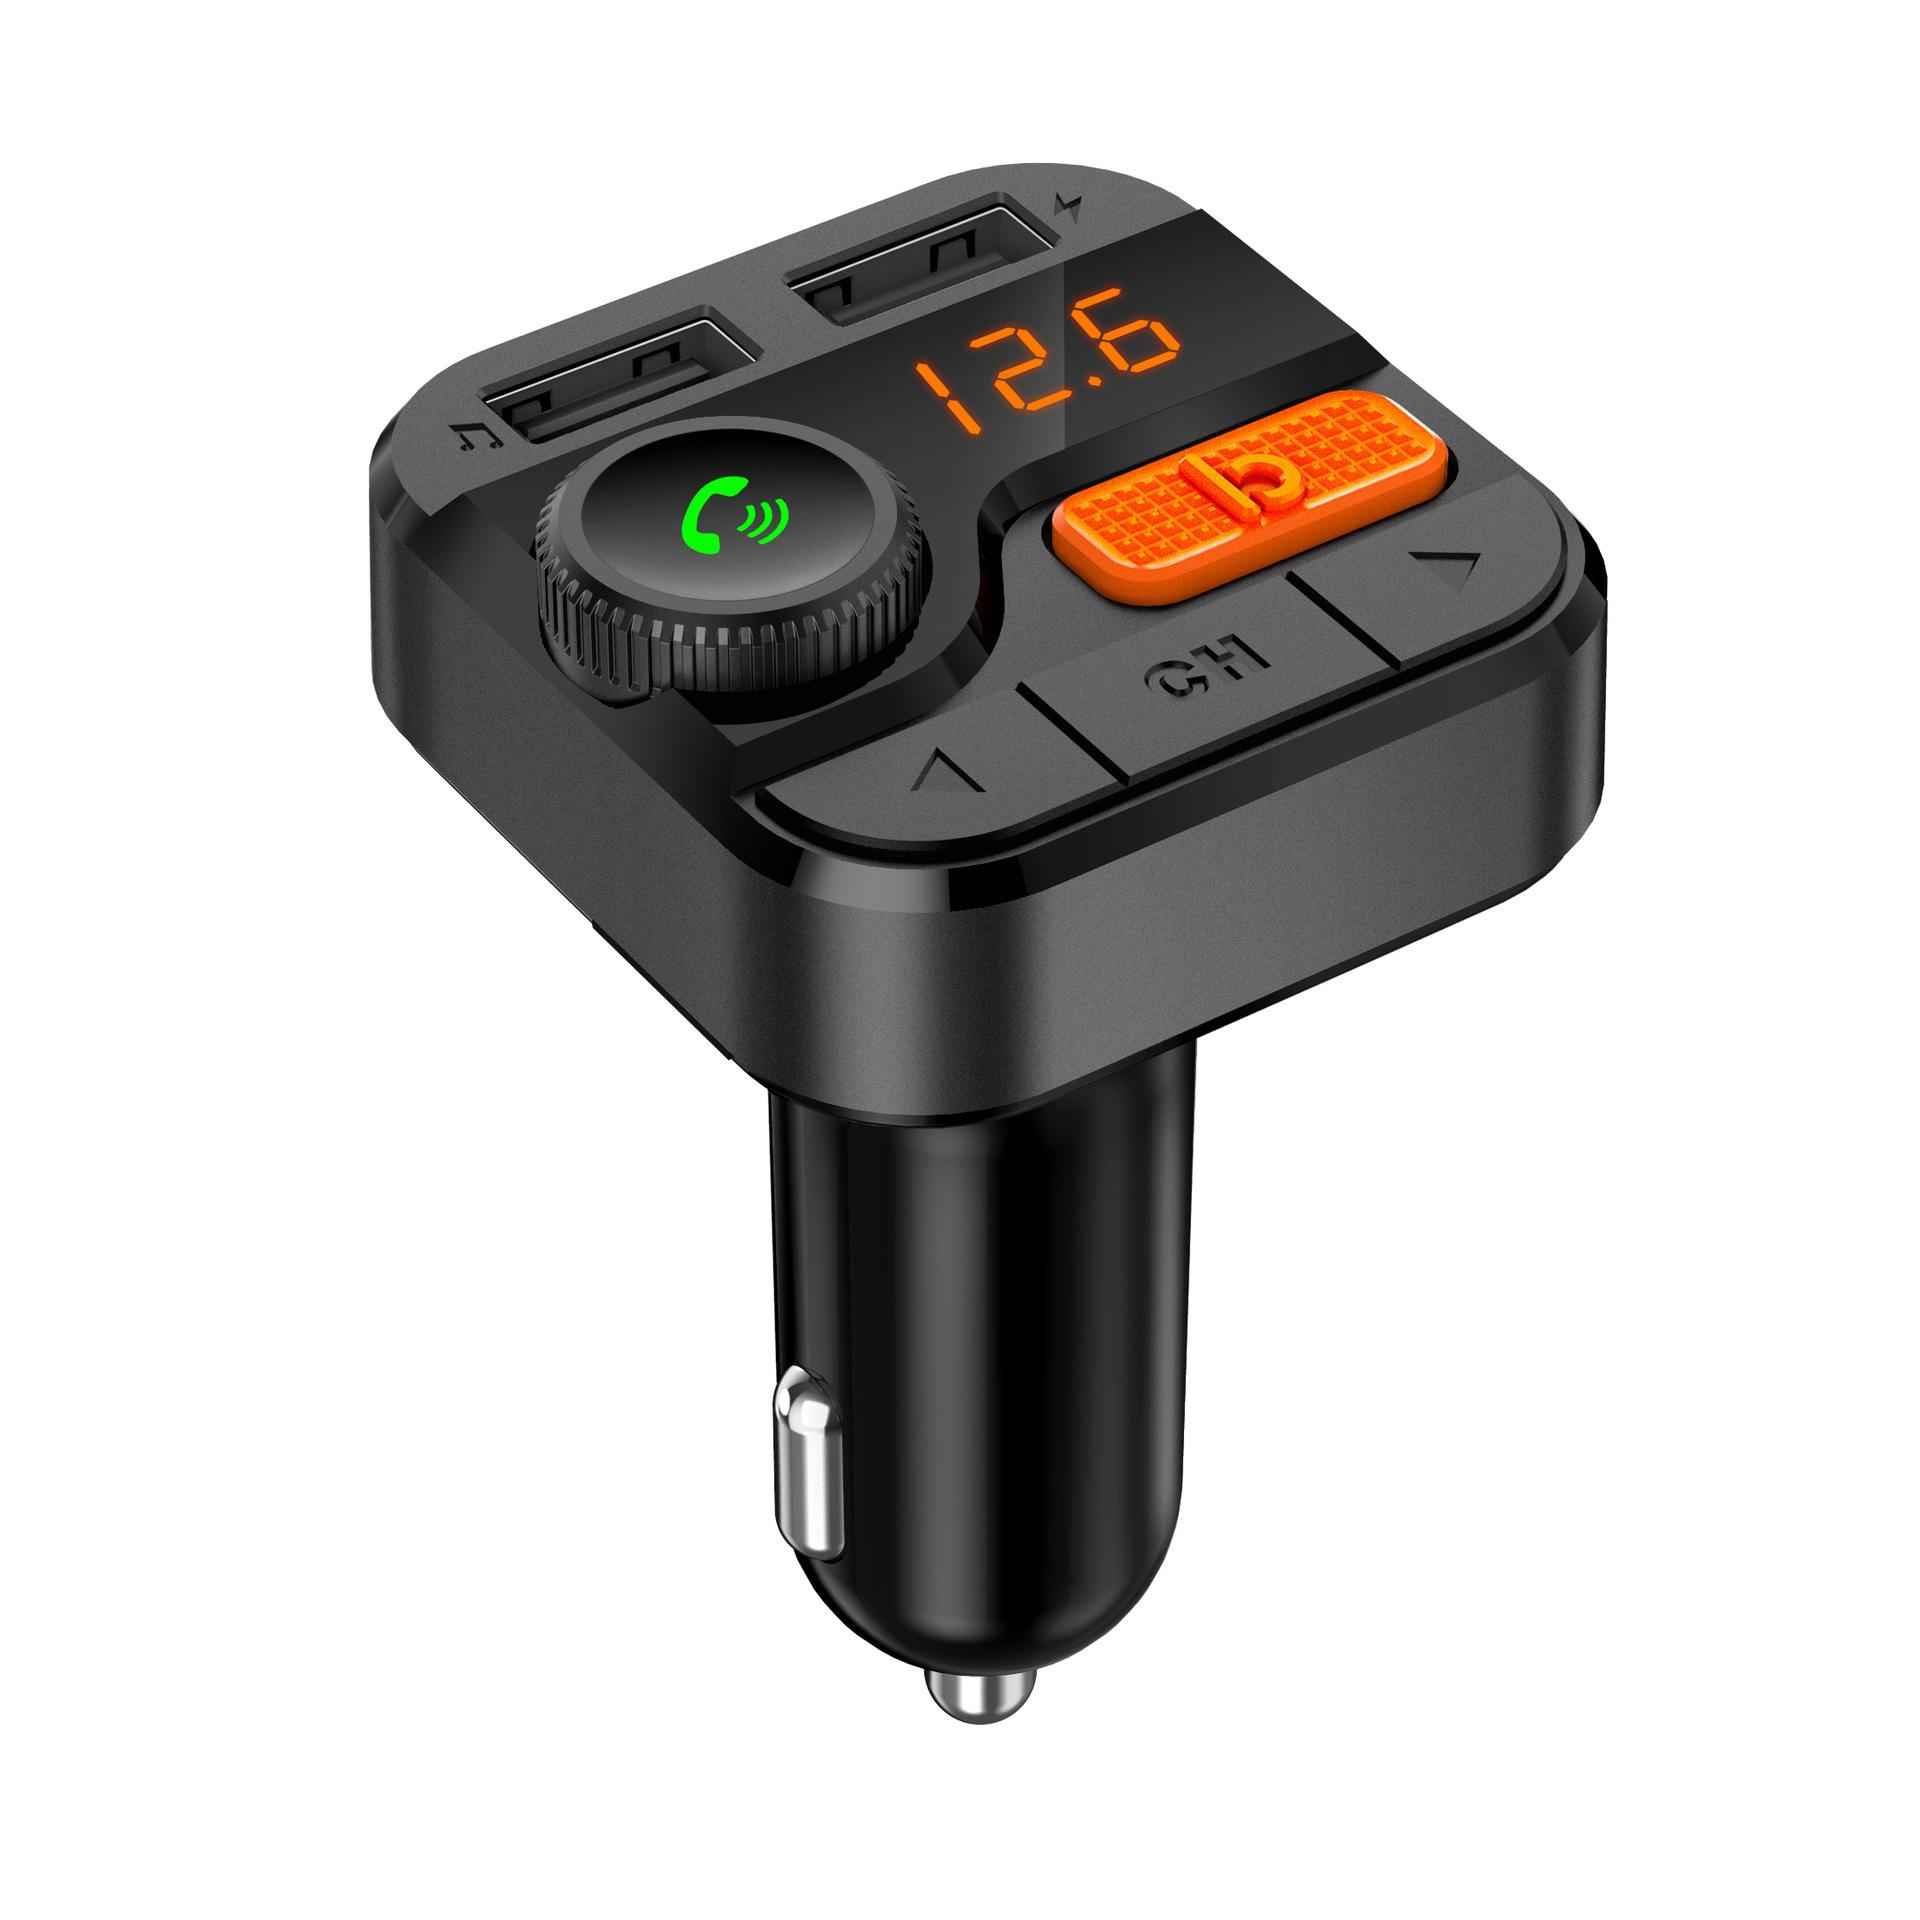 BT82D Wireless 5.0 Car FM Transmitter Bluetooth FM Modulator Phone Car Charge TF MP3 Player Car Accessories Hands-Free